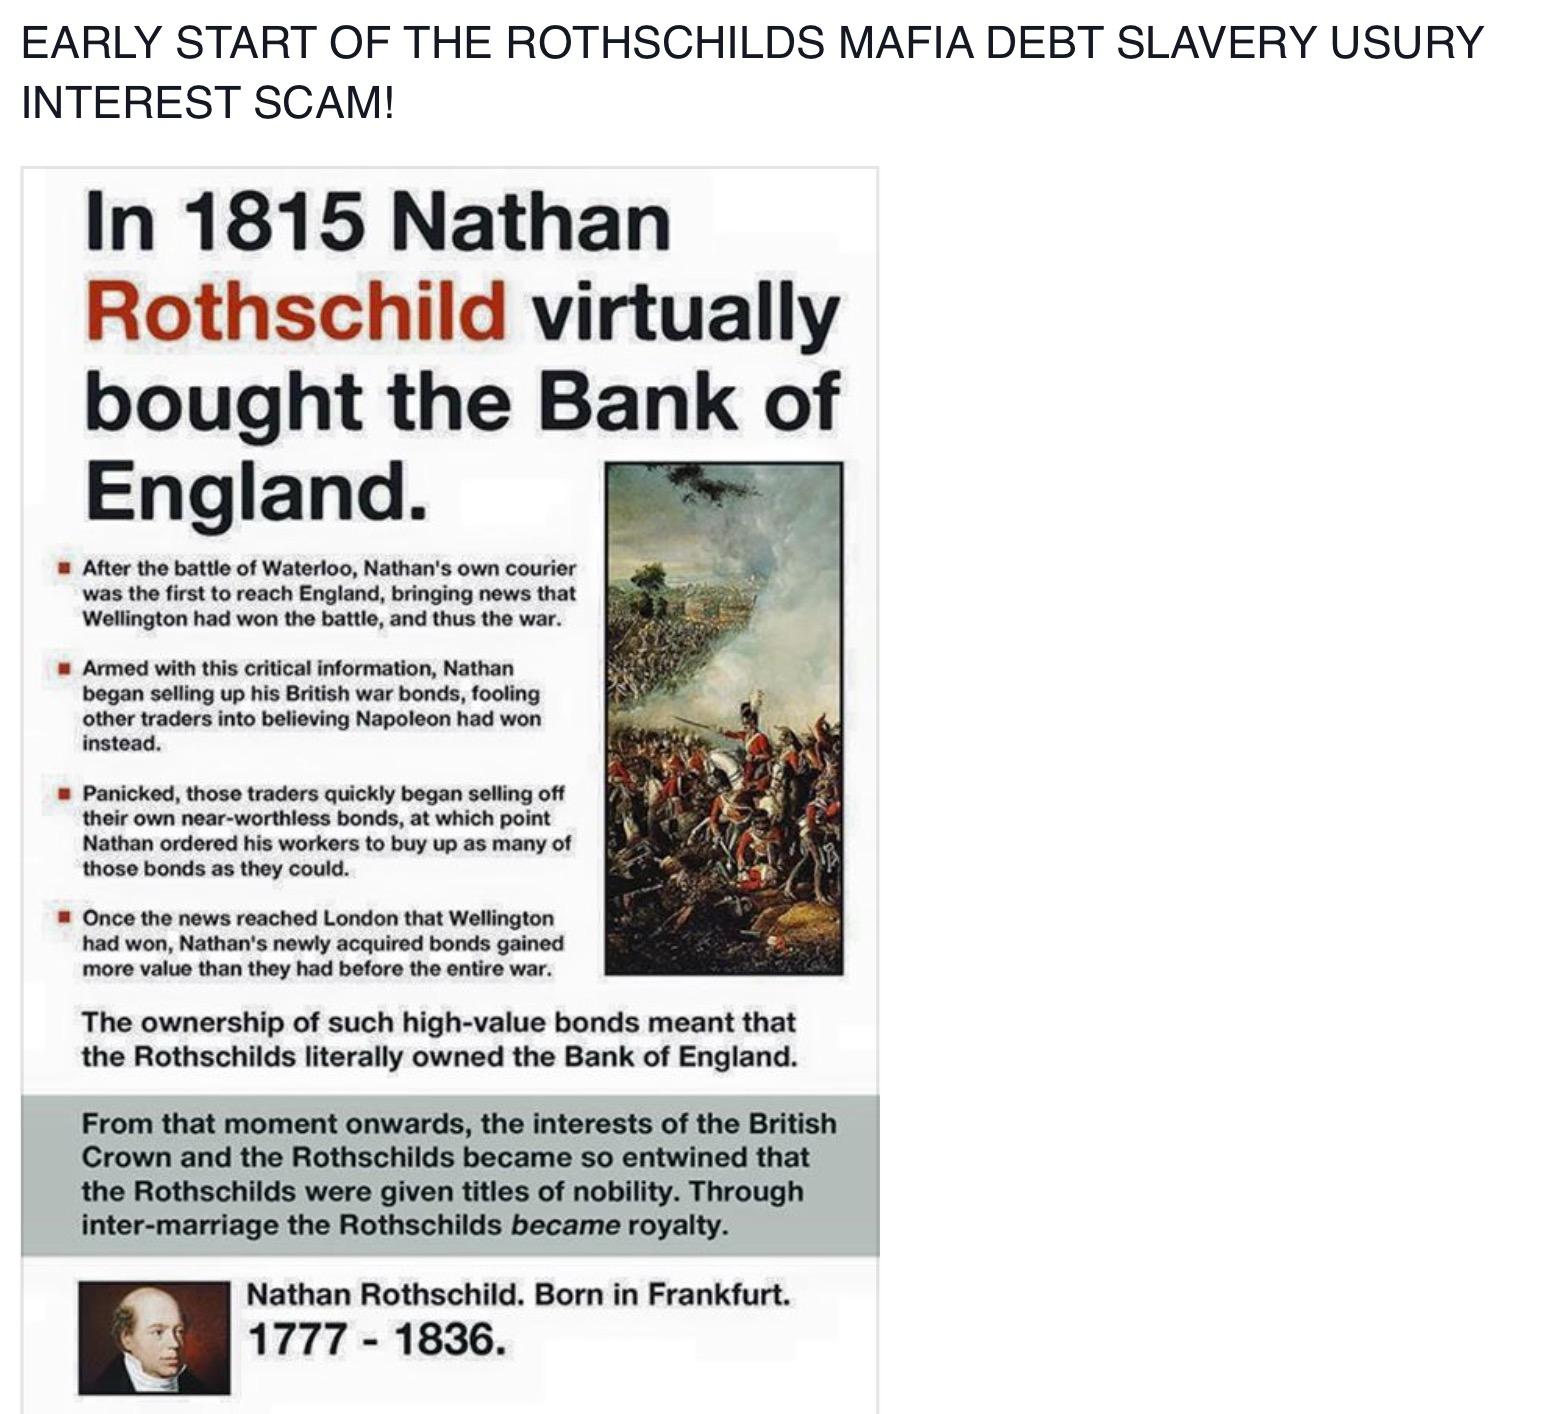 ROTHSCHILDS ZIONIST MAFIA SCAM OF USURY INTEREST = ROBBING HUMANITY